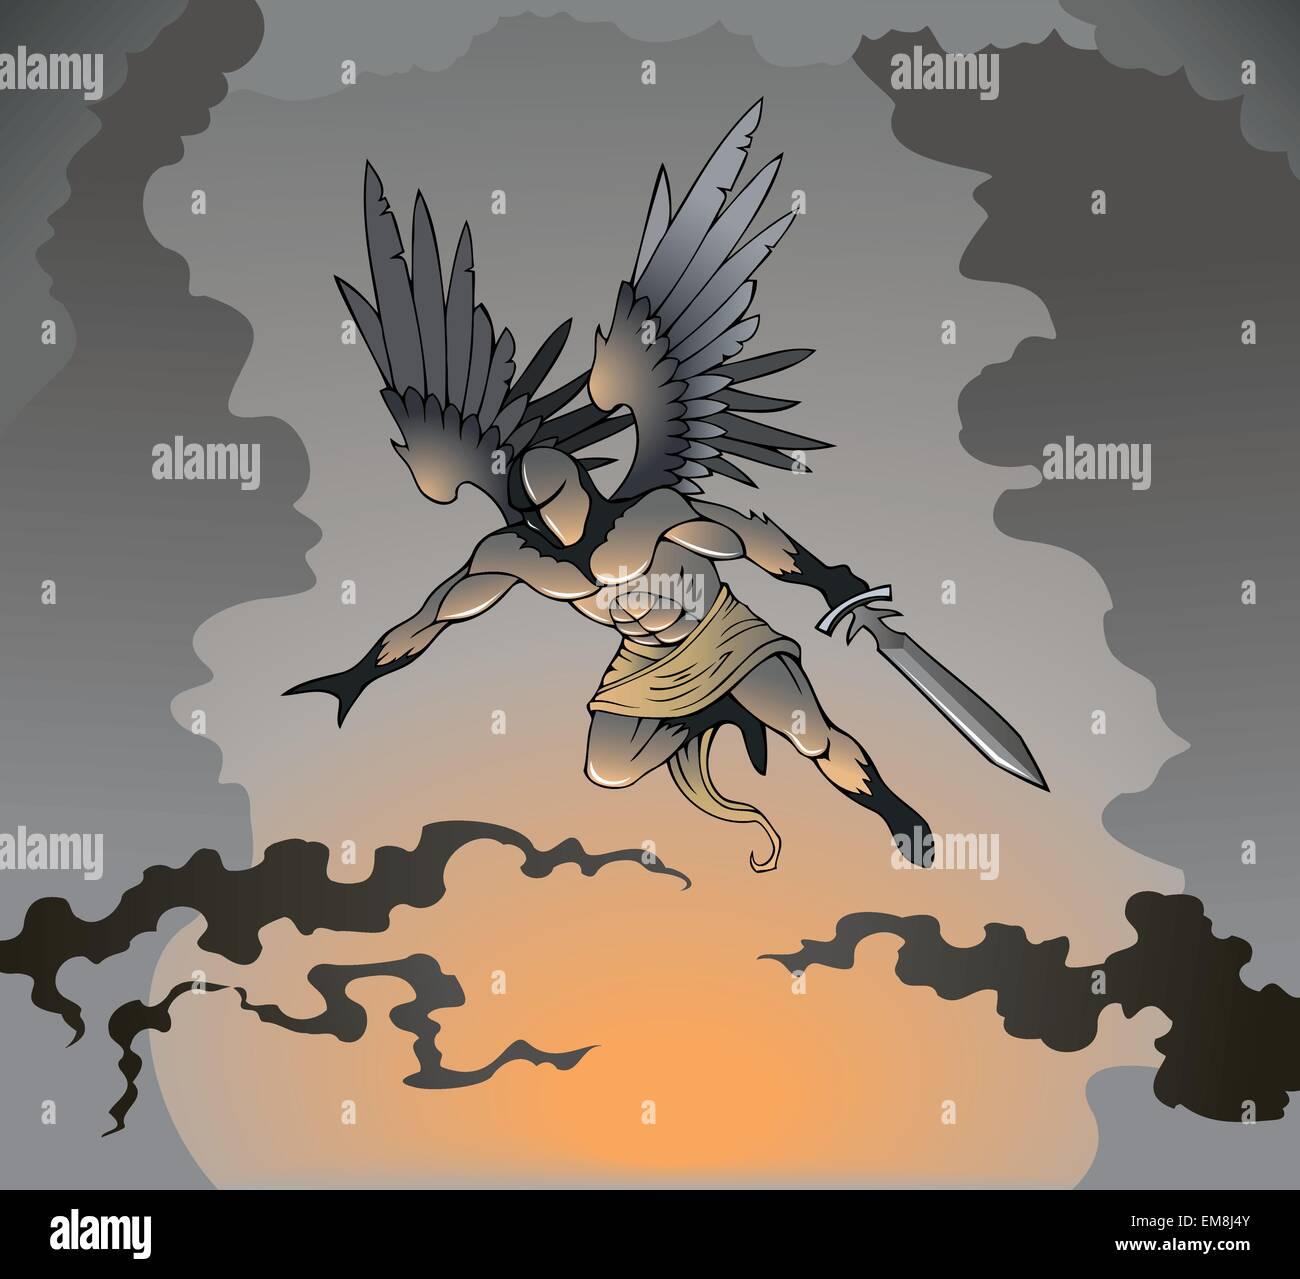 Engel dunkle Analcreme